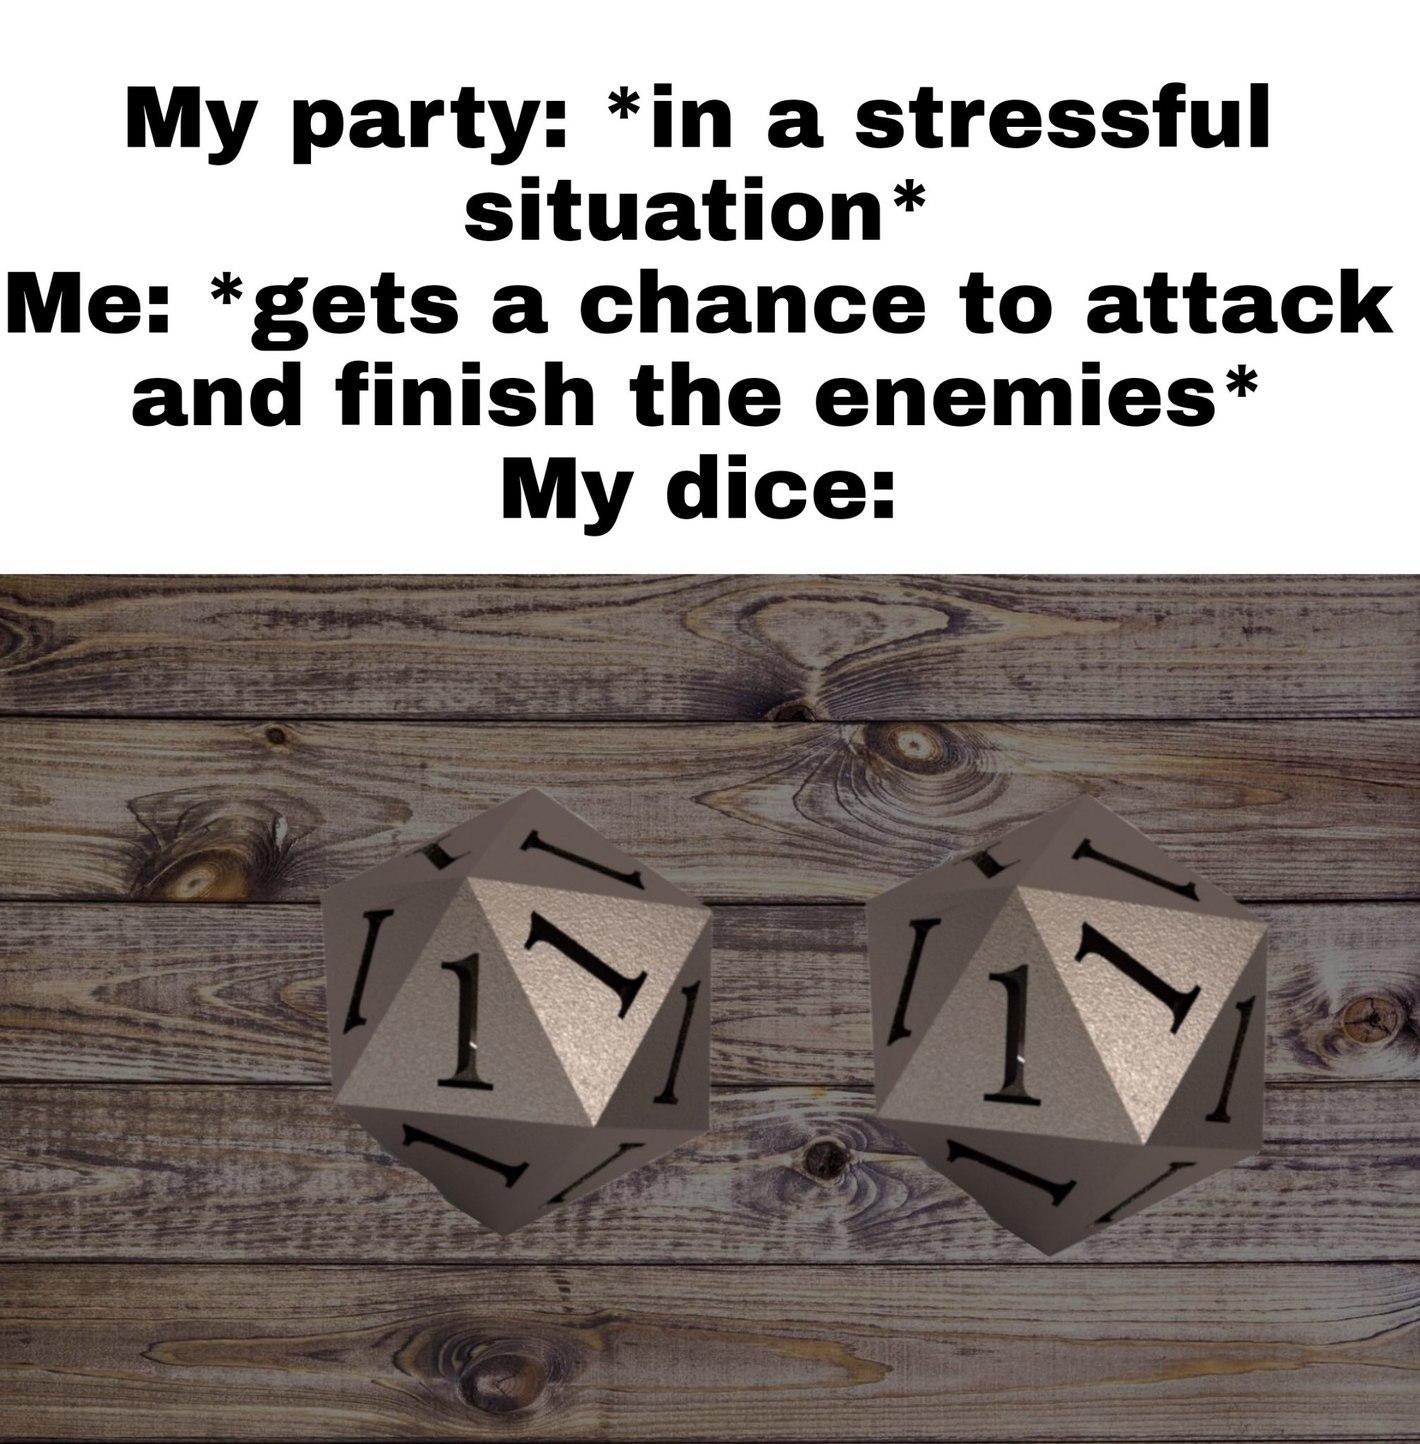 Anyone else or just me? - meme